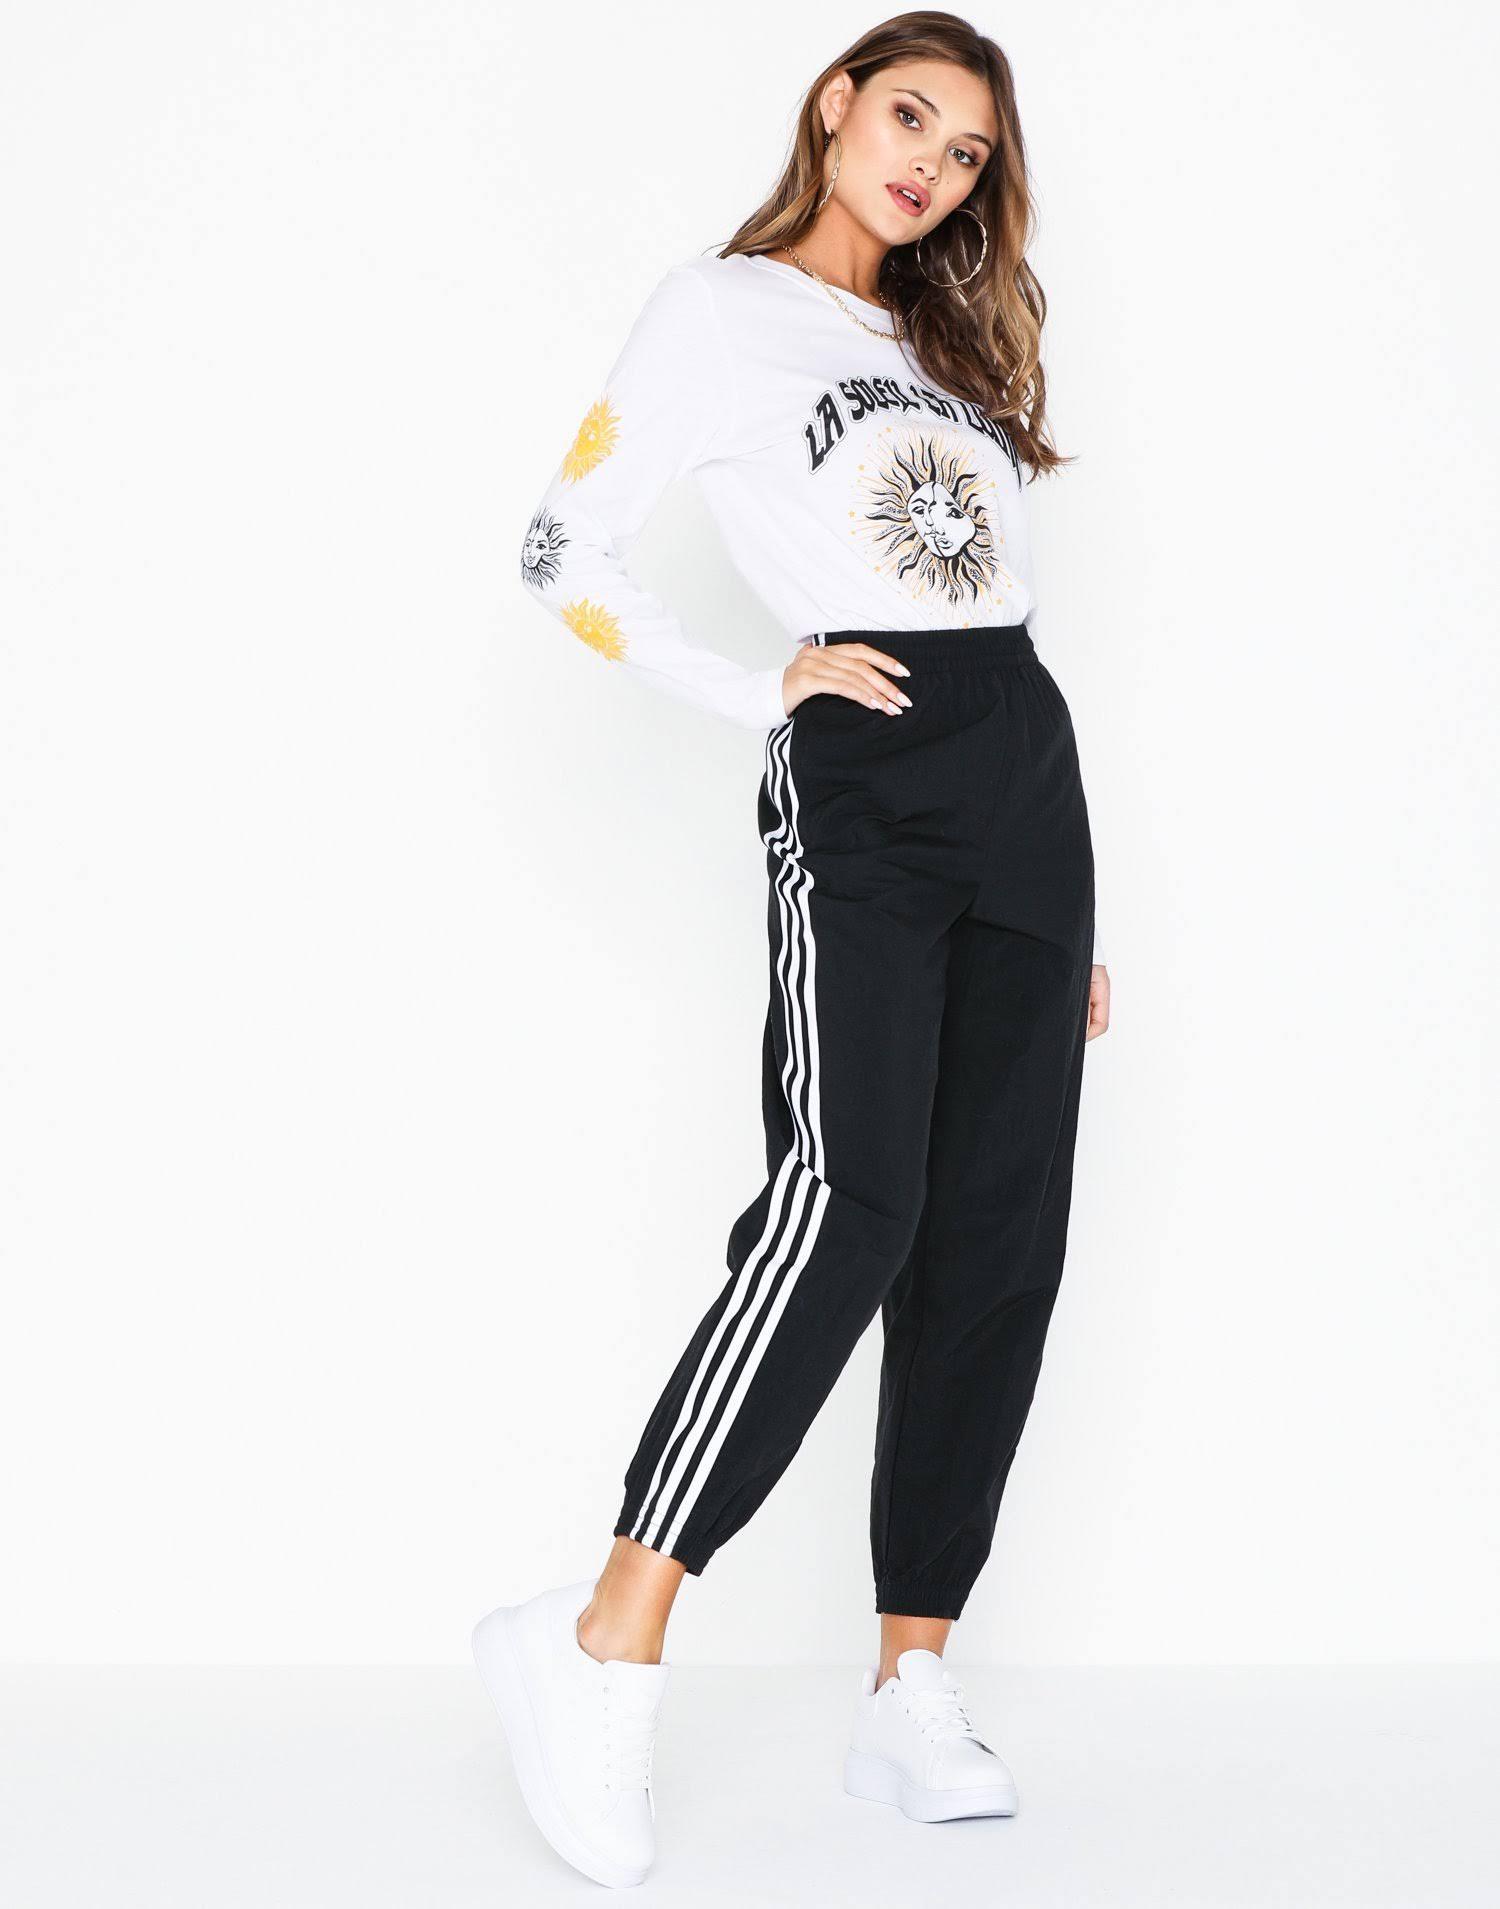 adidas Originals 3-Stripe Track Pants - Black UK 6 at Urban Outfitters